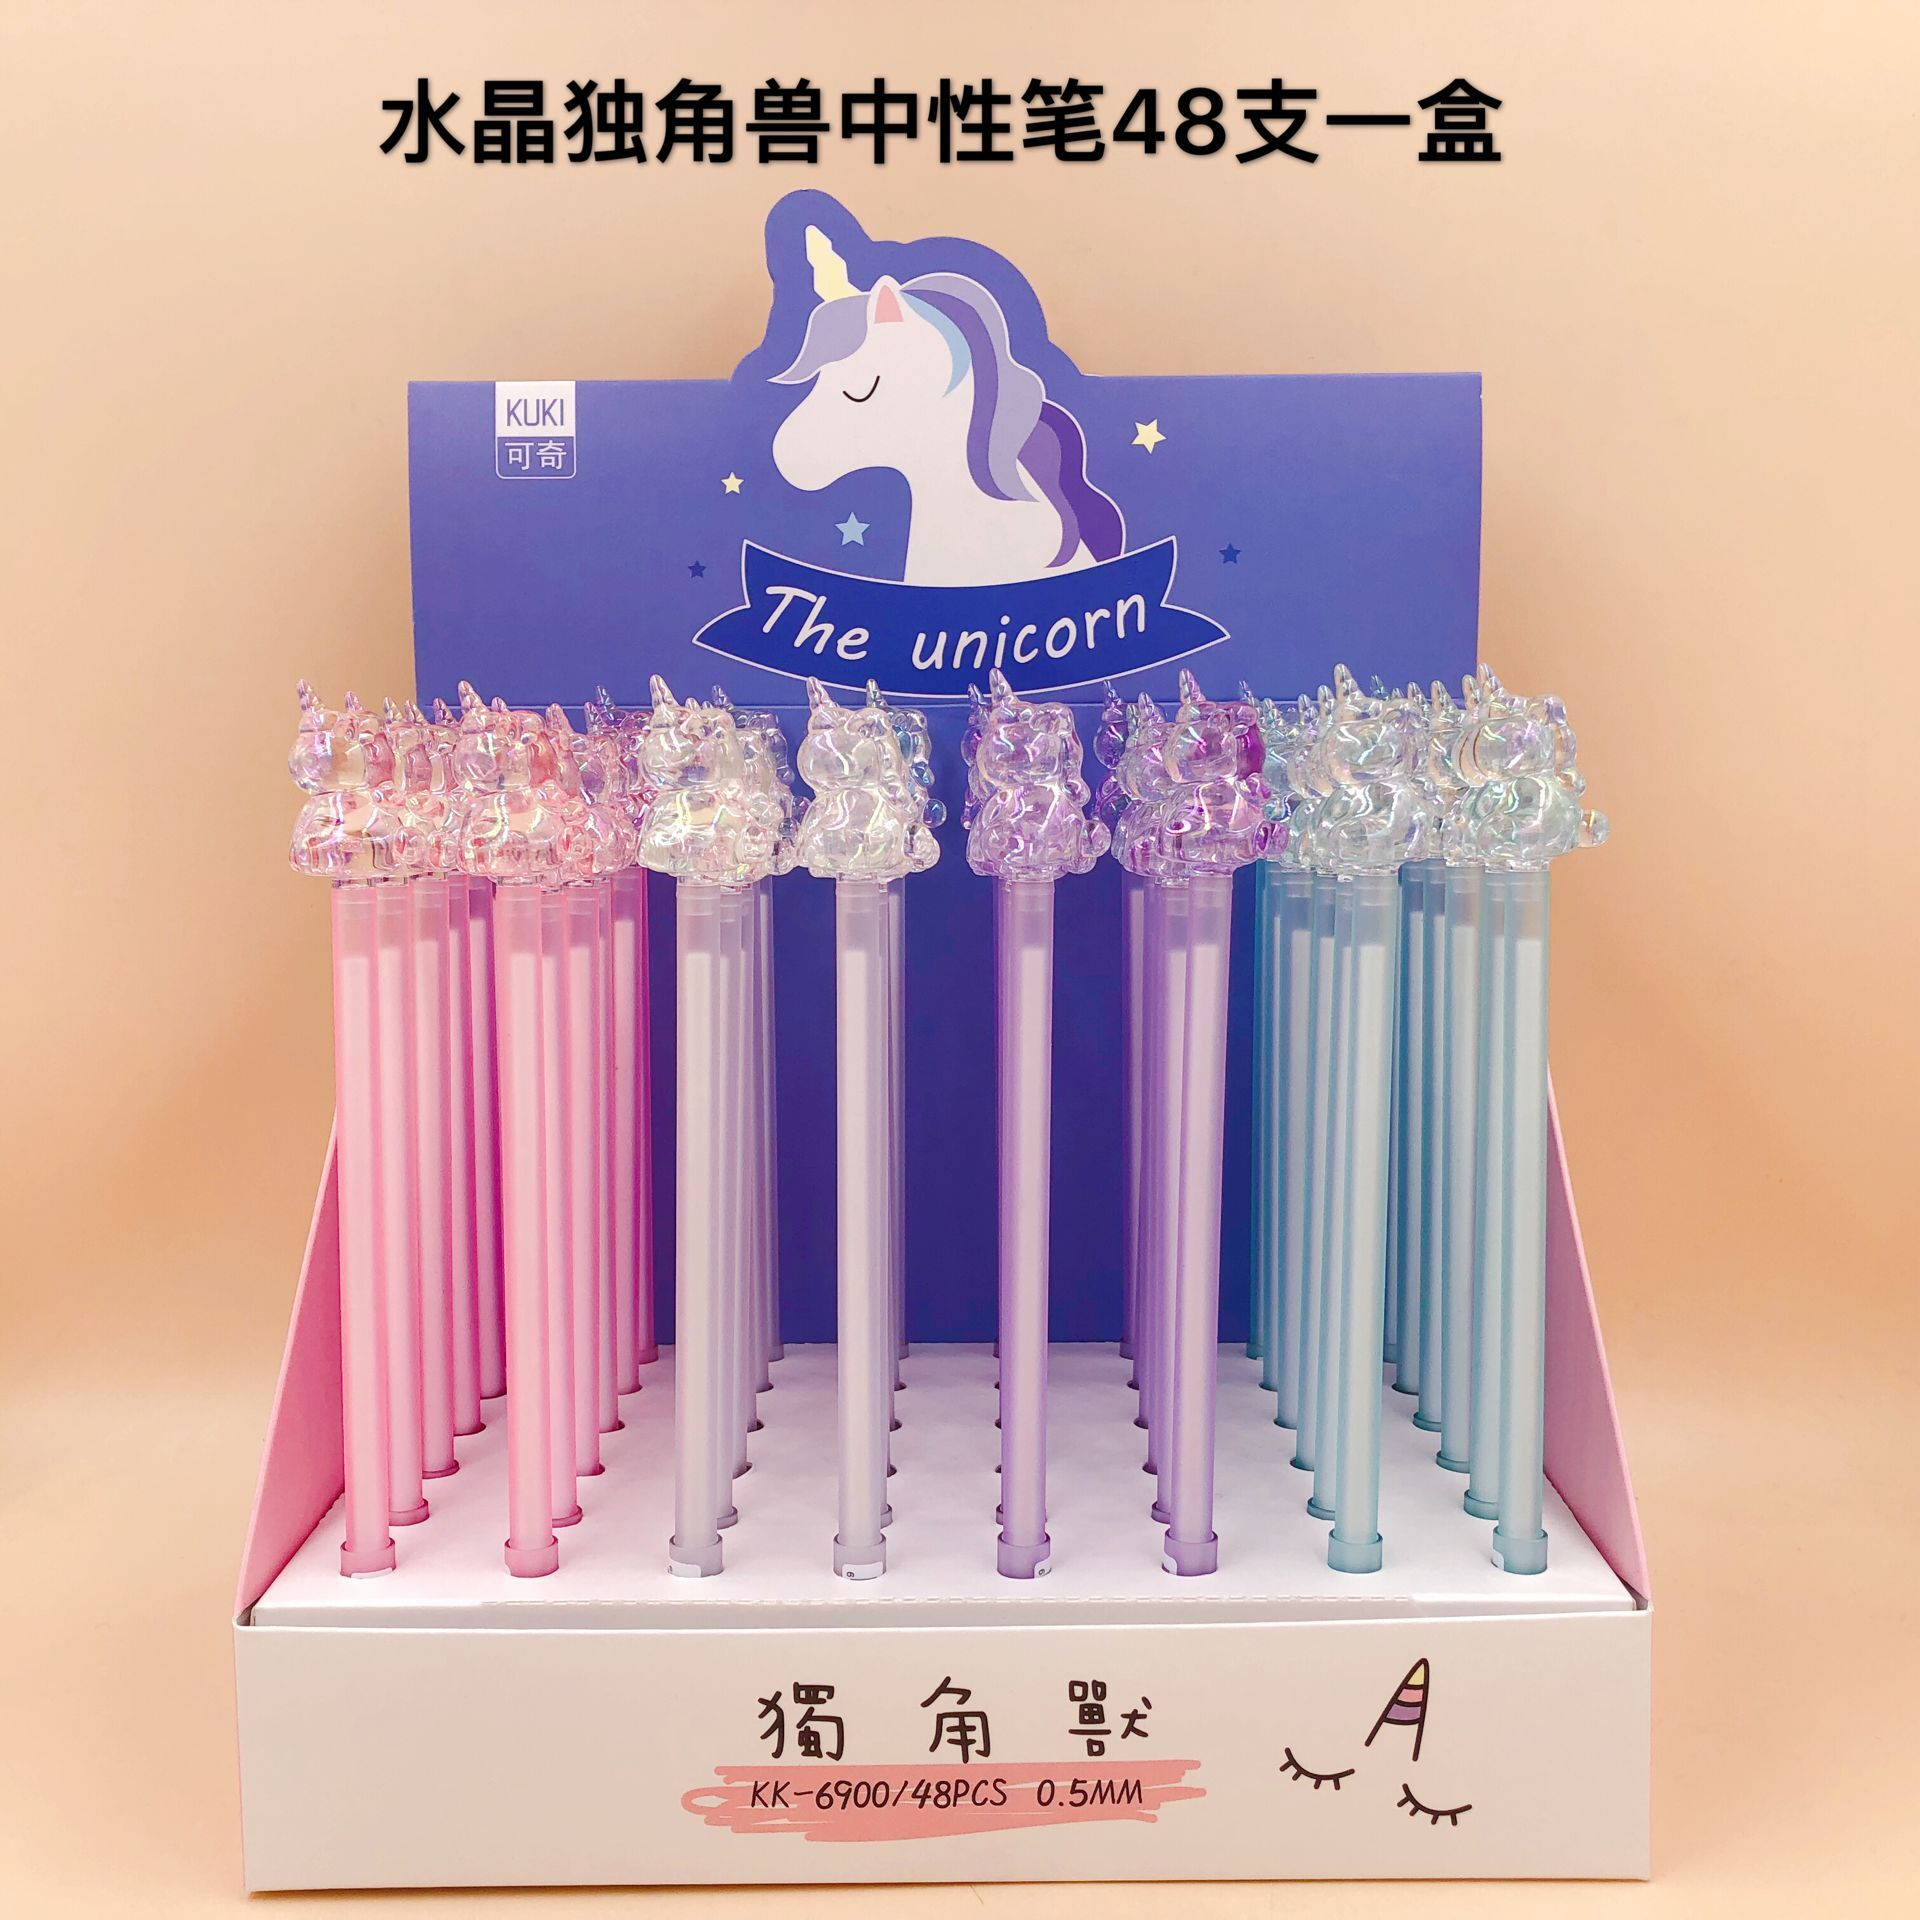 48pcs Writing Pen Black Gel Ink Pens crystal Unicorn Pen for writing Cute stationery Kawaii Gift